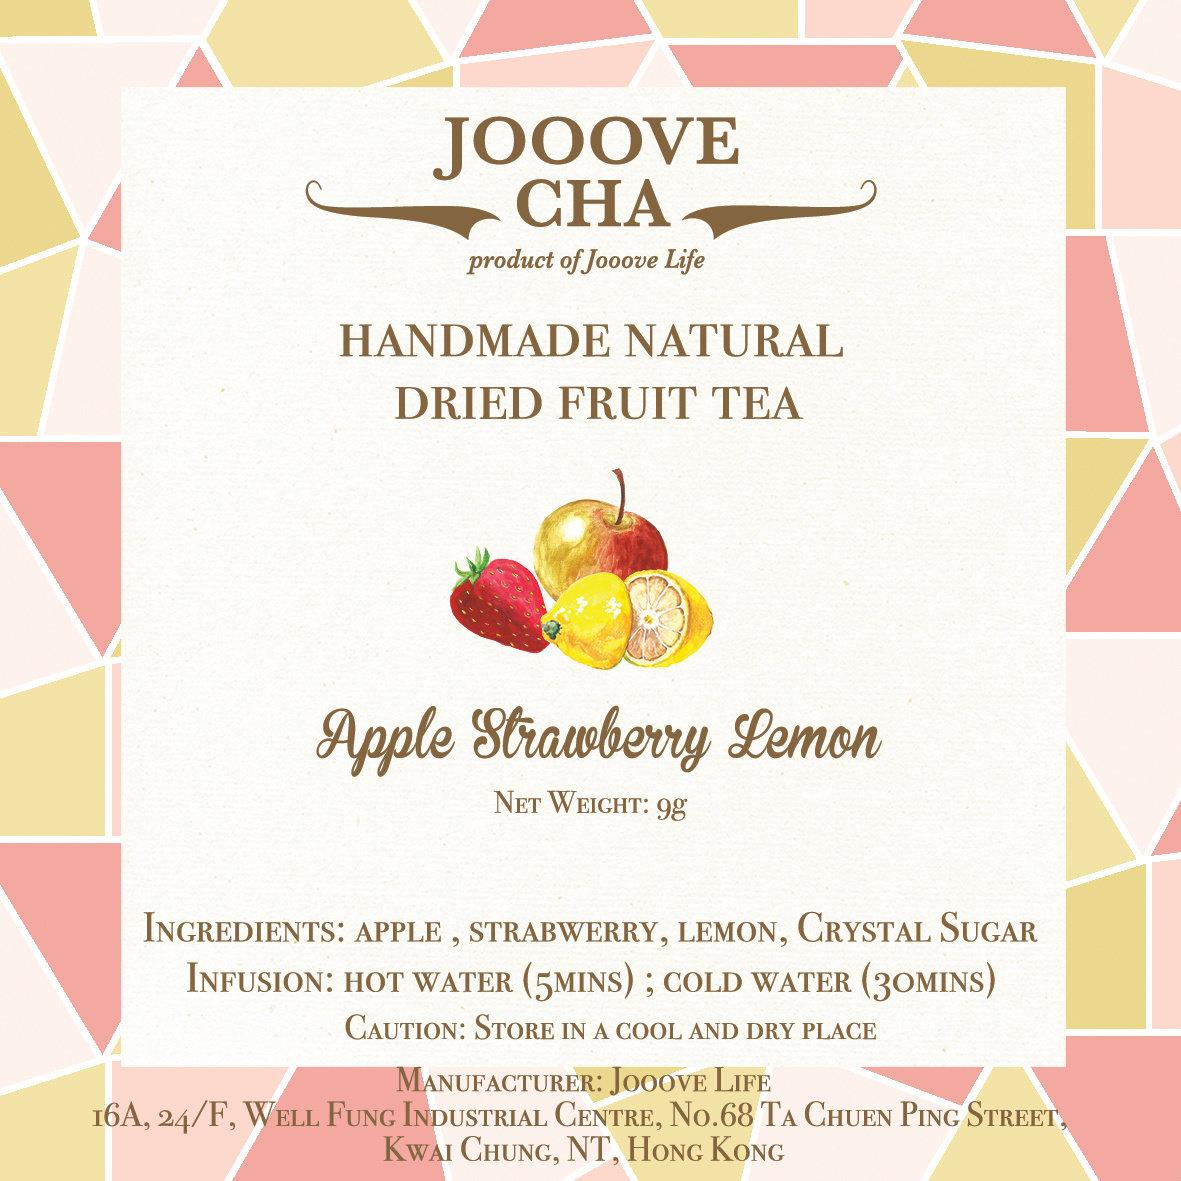 蘋果士多啤梨檸檬果茶  Apple Strawberry  Fruit Tea